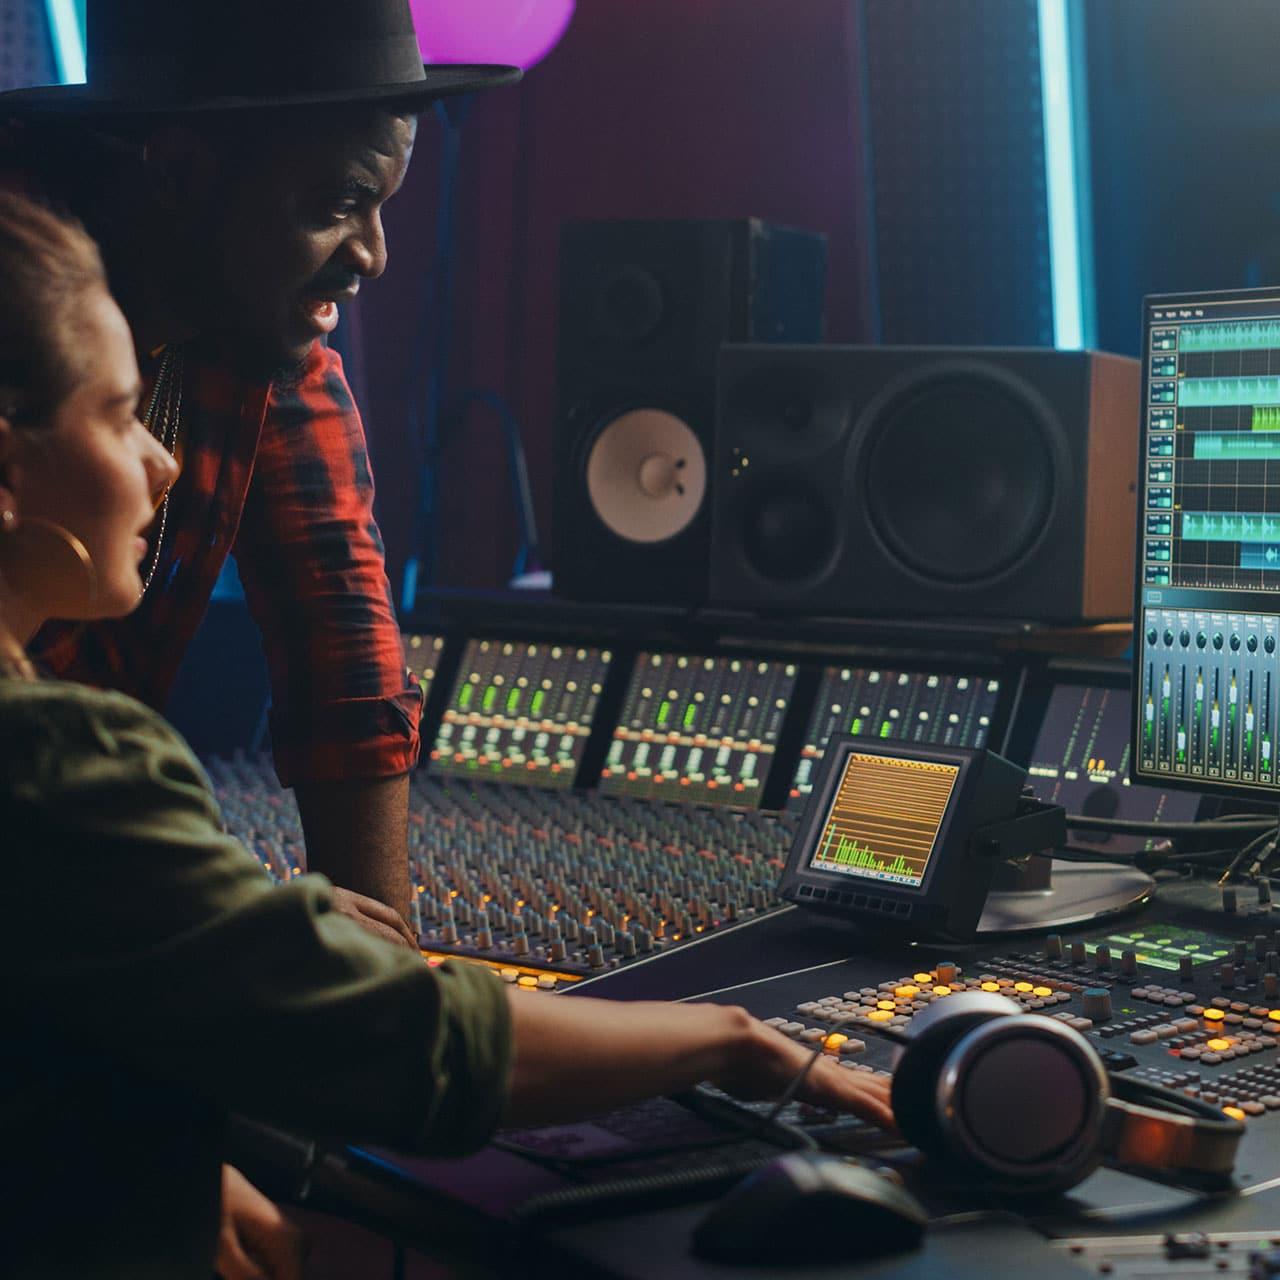 Image of professionals creating music